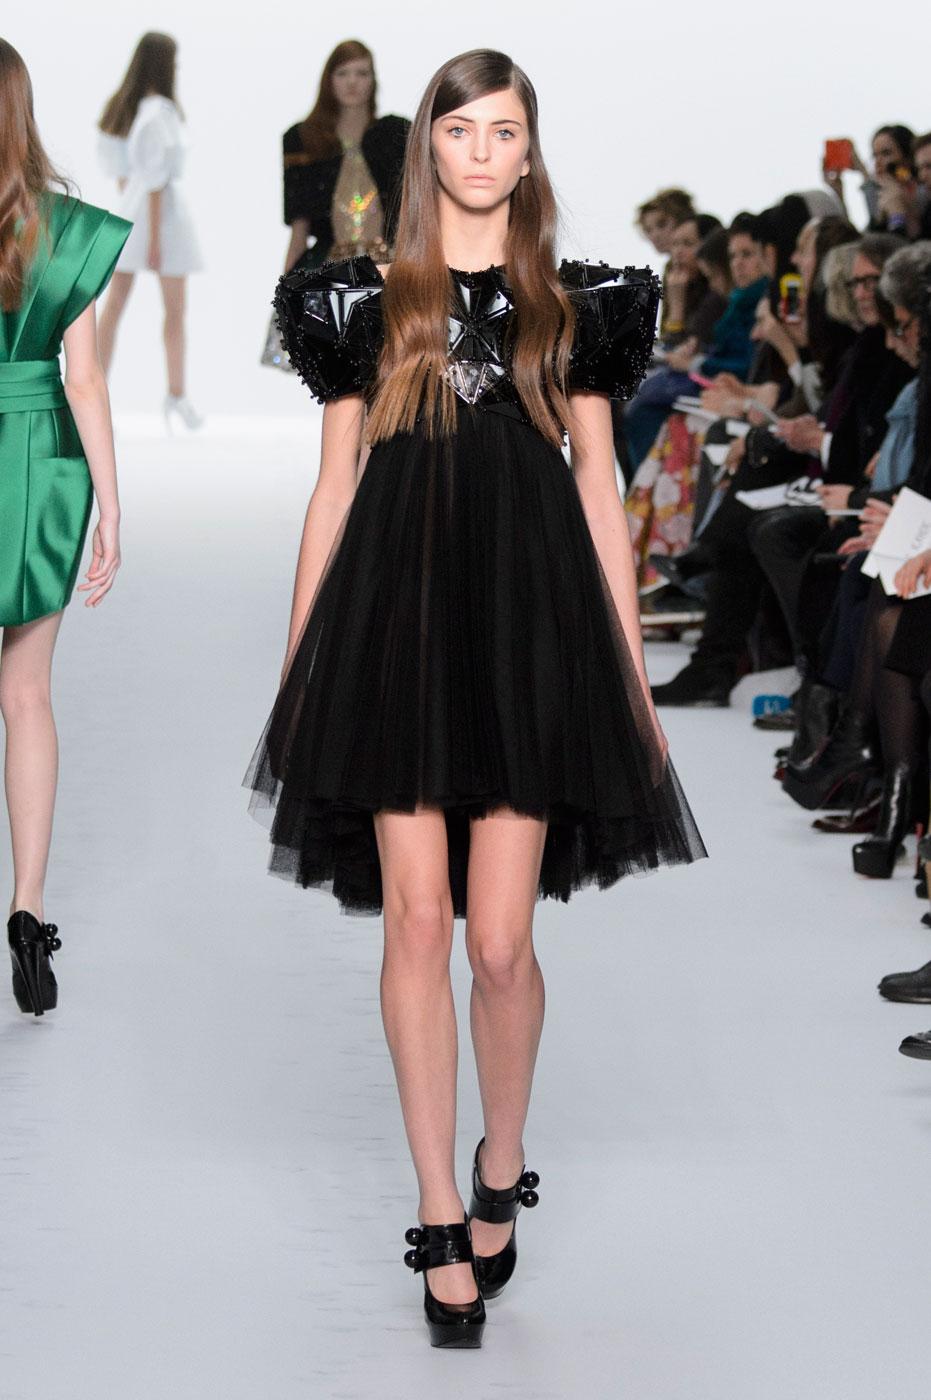 Kayek-fashion-runway-show-haute-couture-paris-spring-summer-2015-the-impression-33